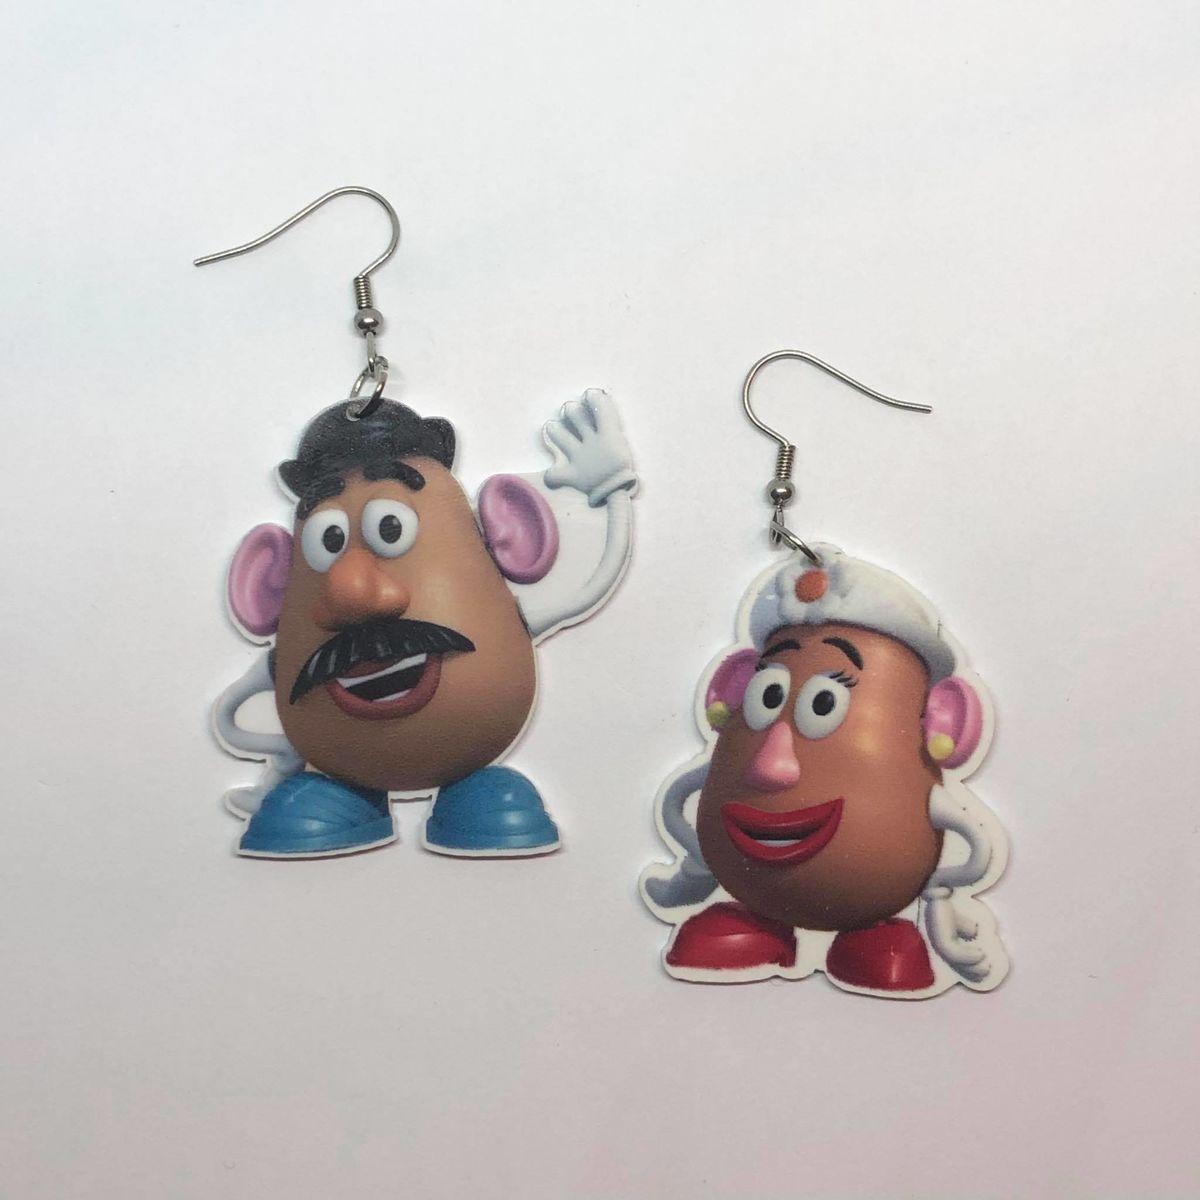 Mr Potato Head Toy Story Tiny Stud Studs Earring Pair Earrings Cute Small Disney Inspired Charm Y2K Kawaii Cute Japanese Art Hoe Culture Harajuku Vintage Aesthetic Retro KPOP